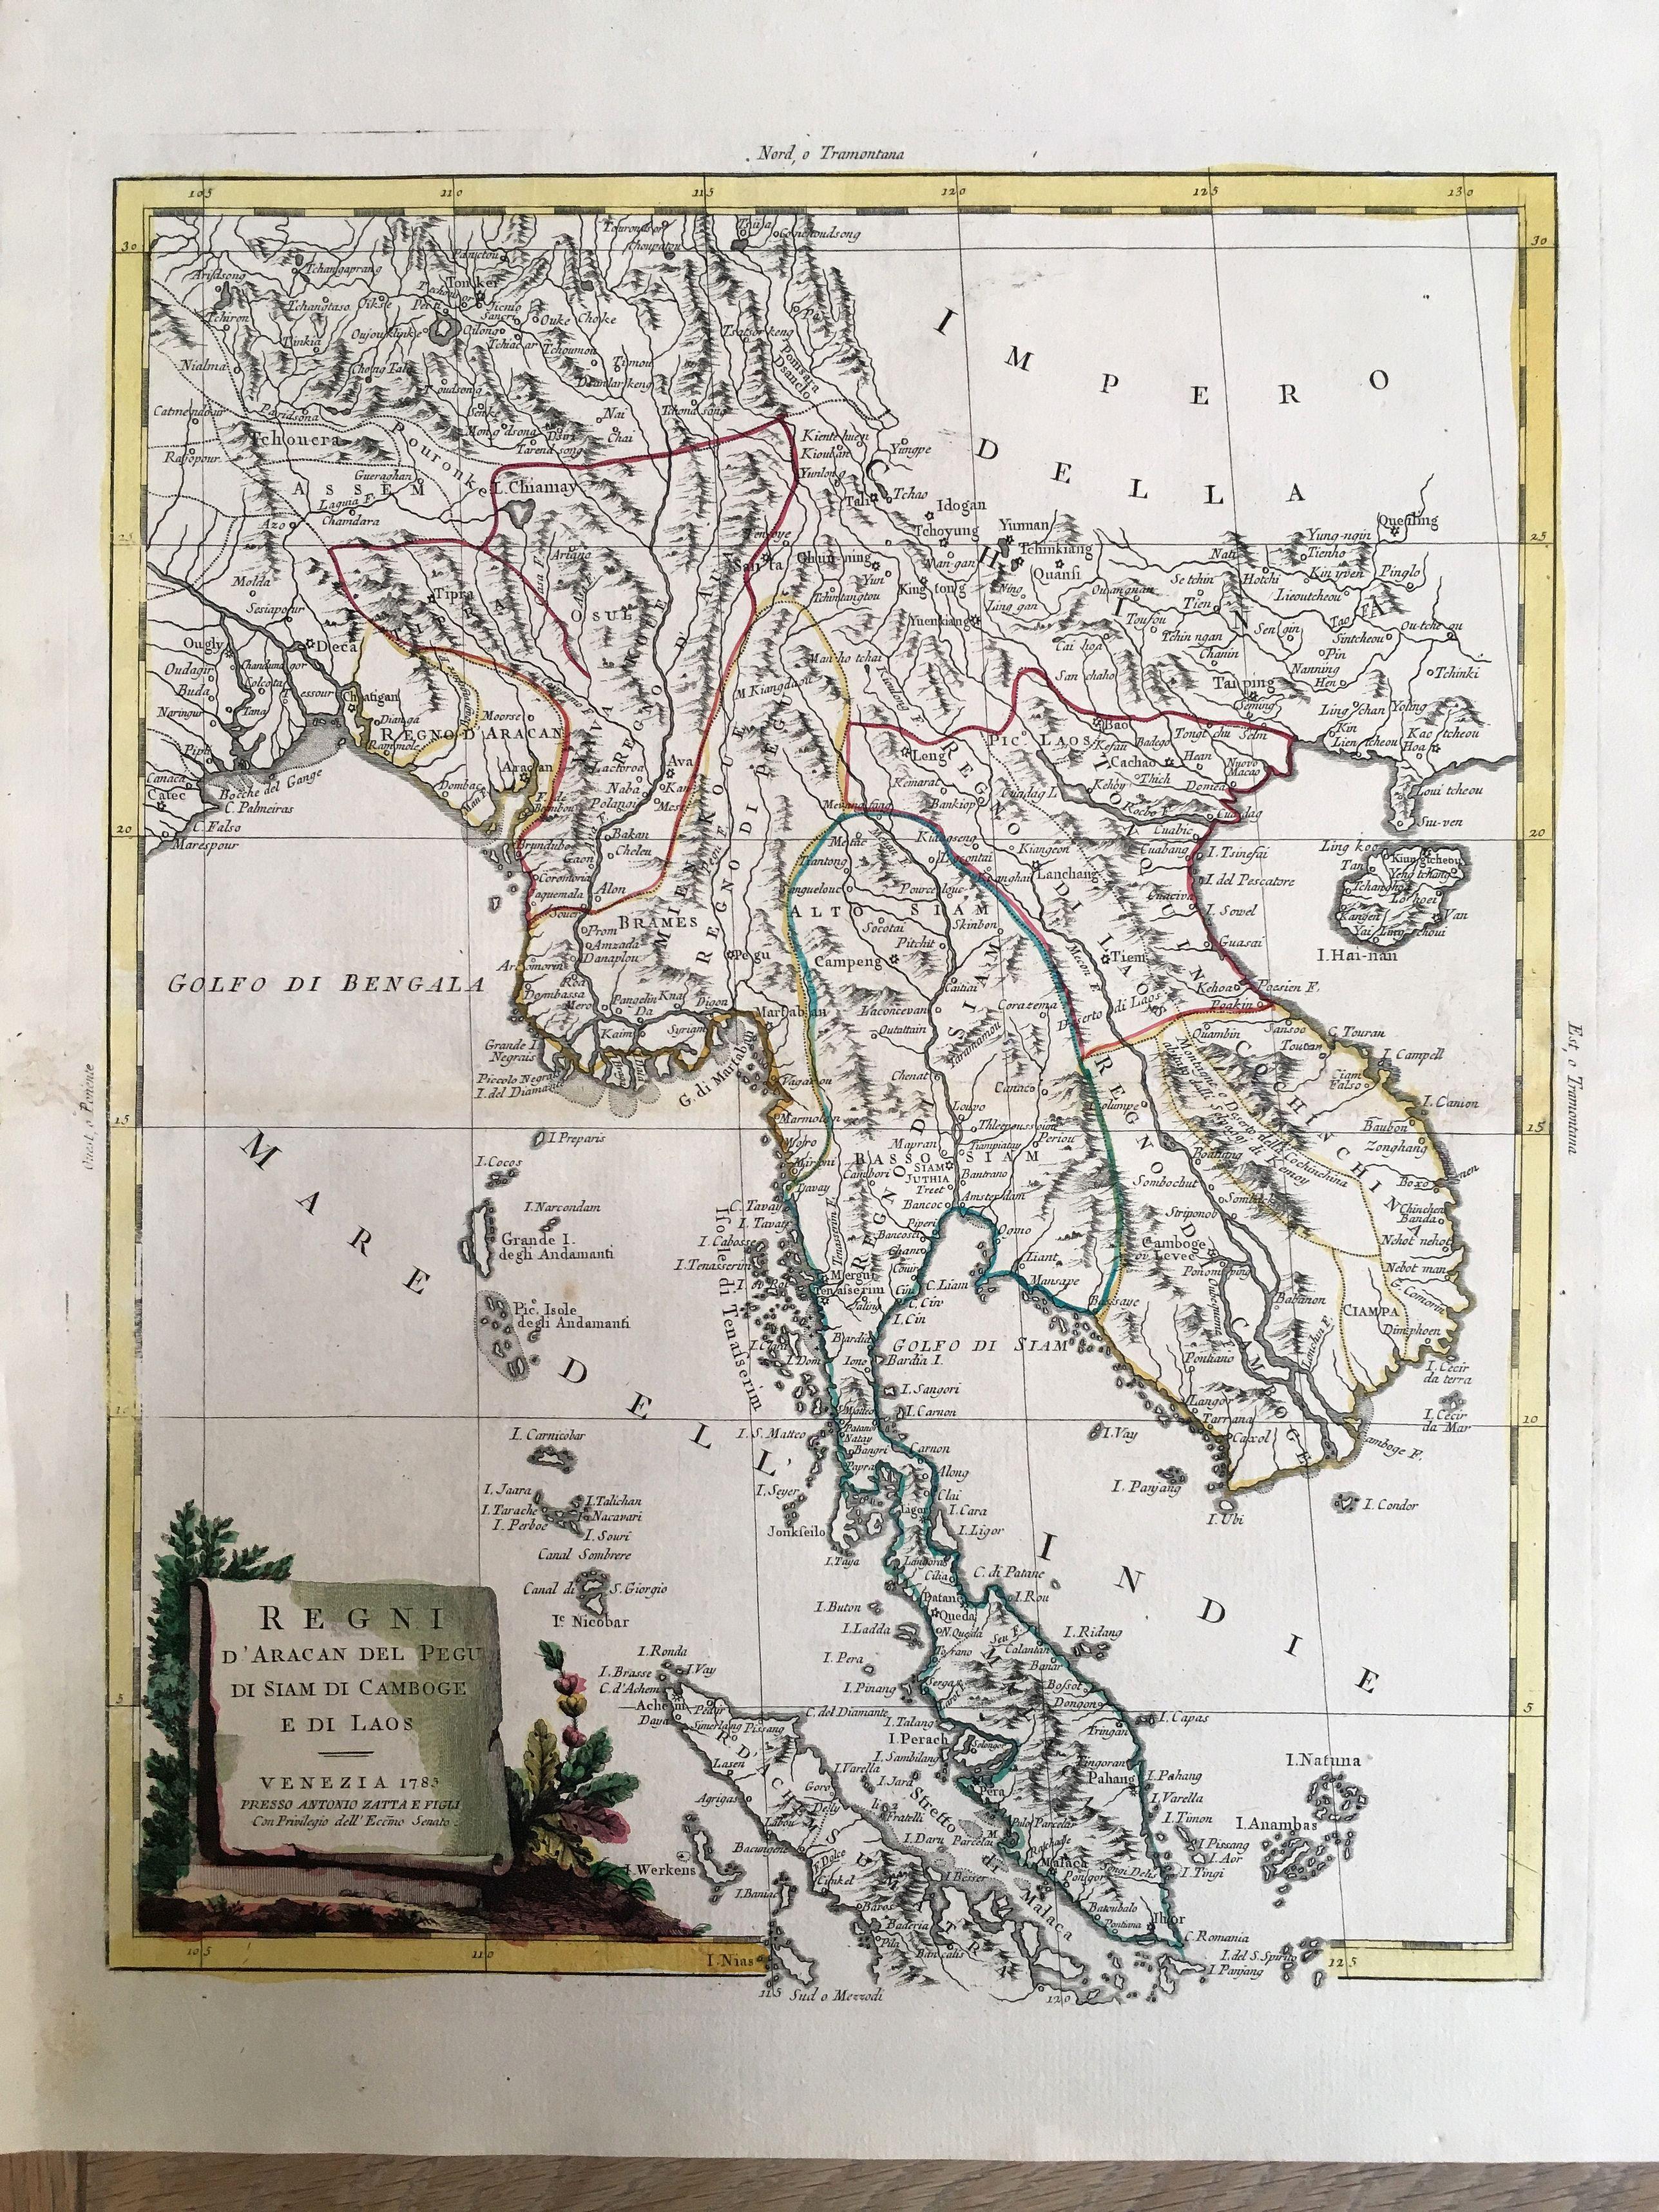 ZATTA, A. - Regni D'Aracan Del Pegu Di Siam Di Camboge E Di Laos.